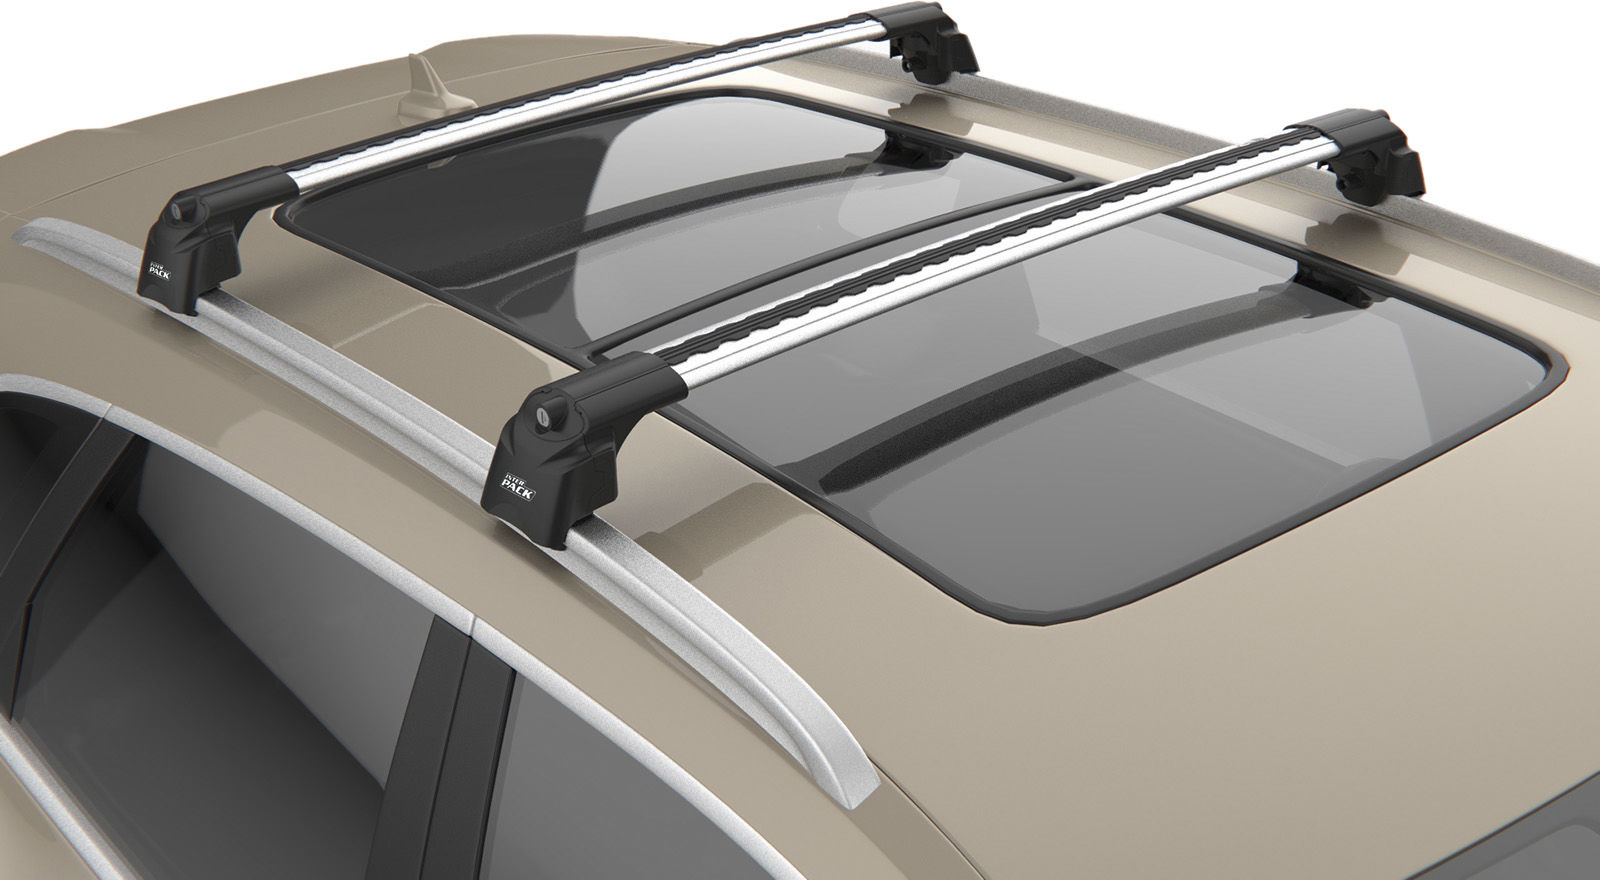 Inter Pack Quiet XT IR Bagażnik dachowy Mercedes-Benz C klasa kombi (S205) (belki 90/86 cm)